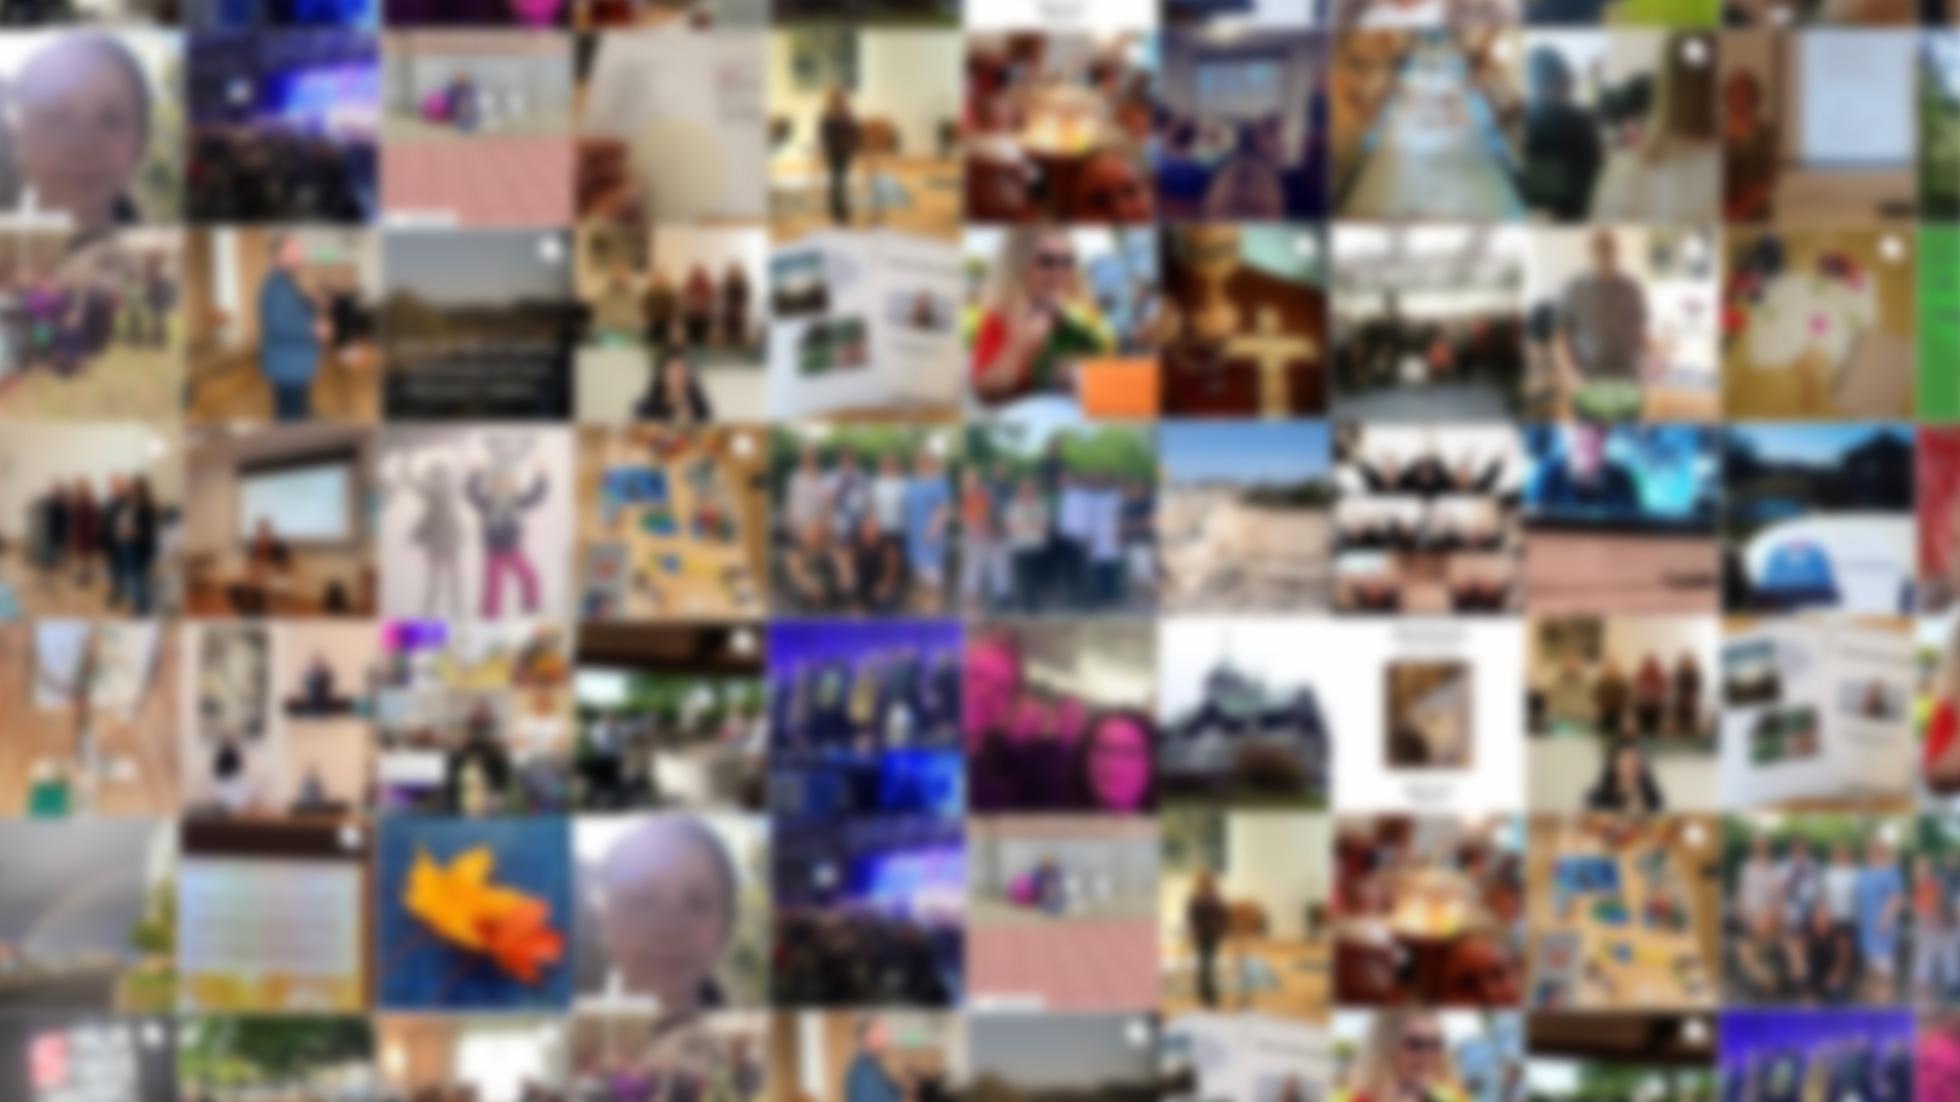 Suddigt collage med instagramfoton